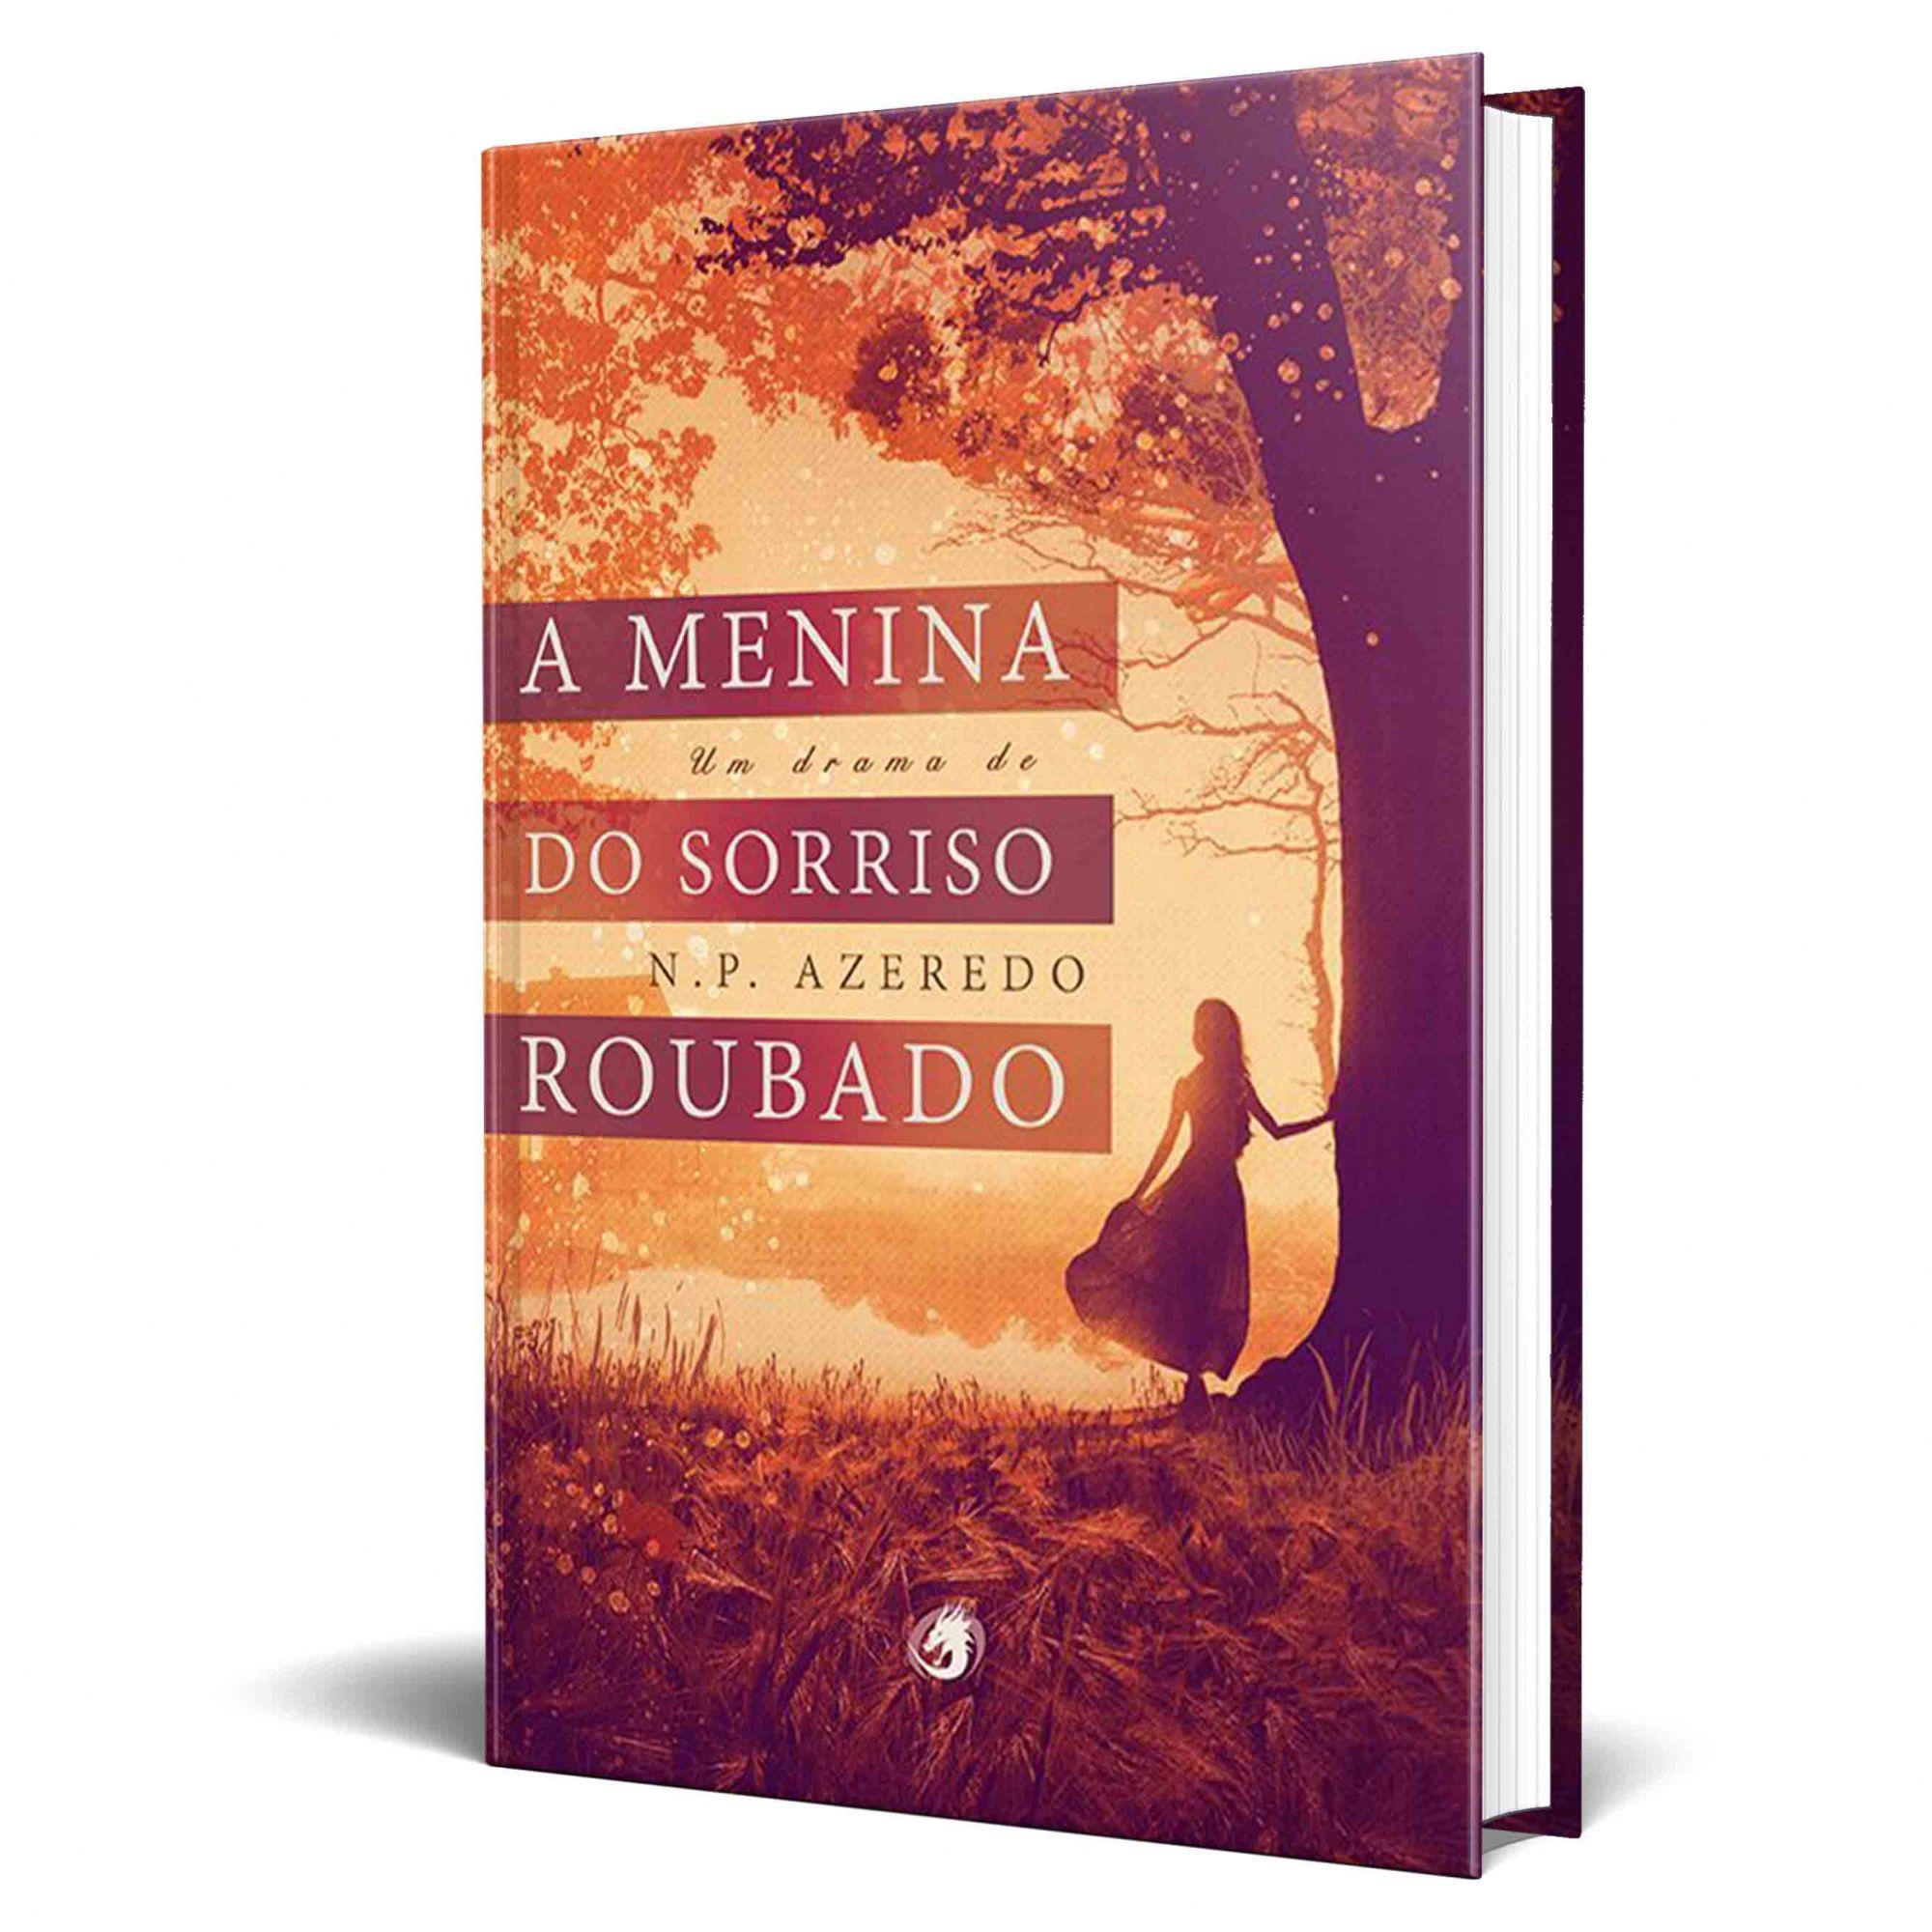 Livro A Menina do Sorriso Roubado